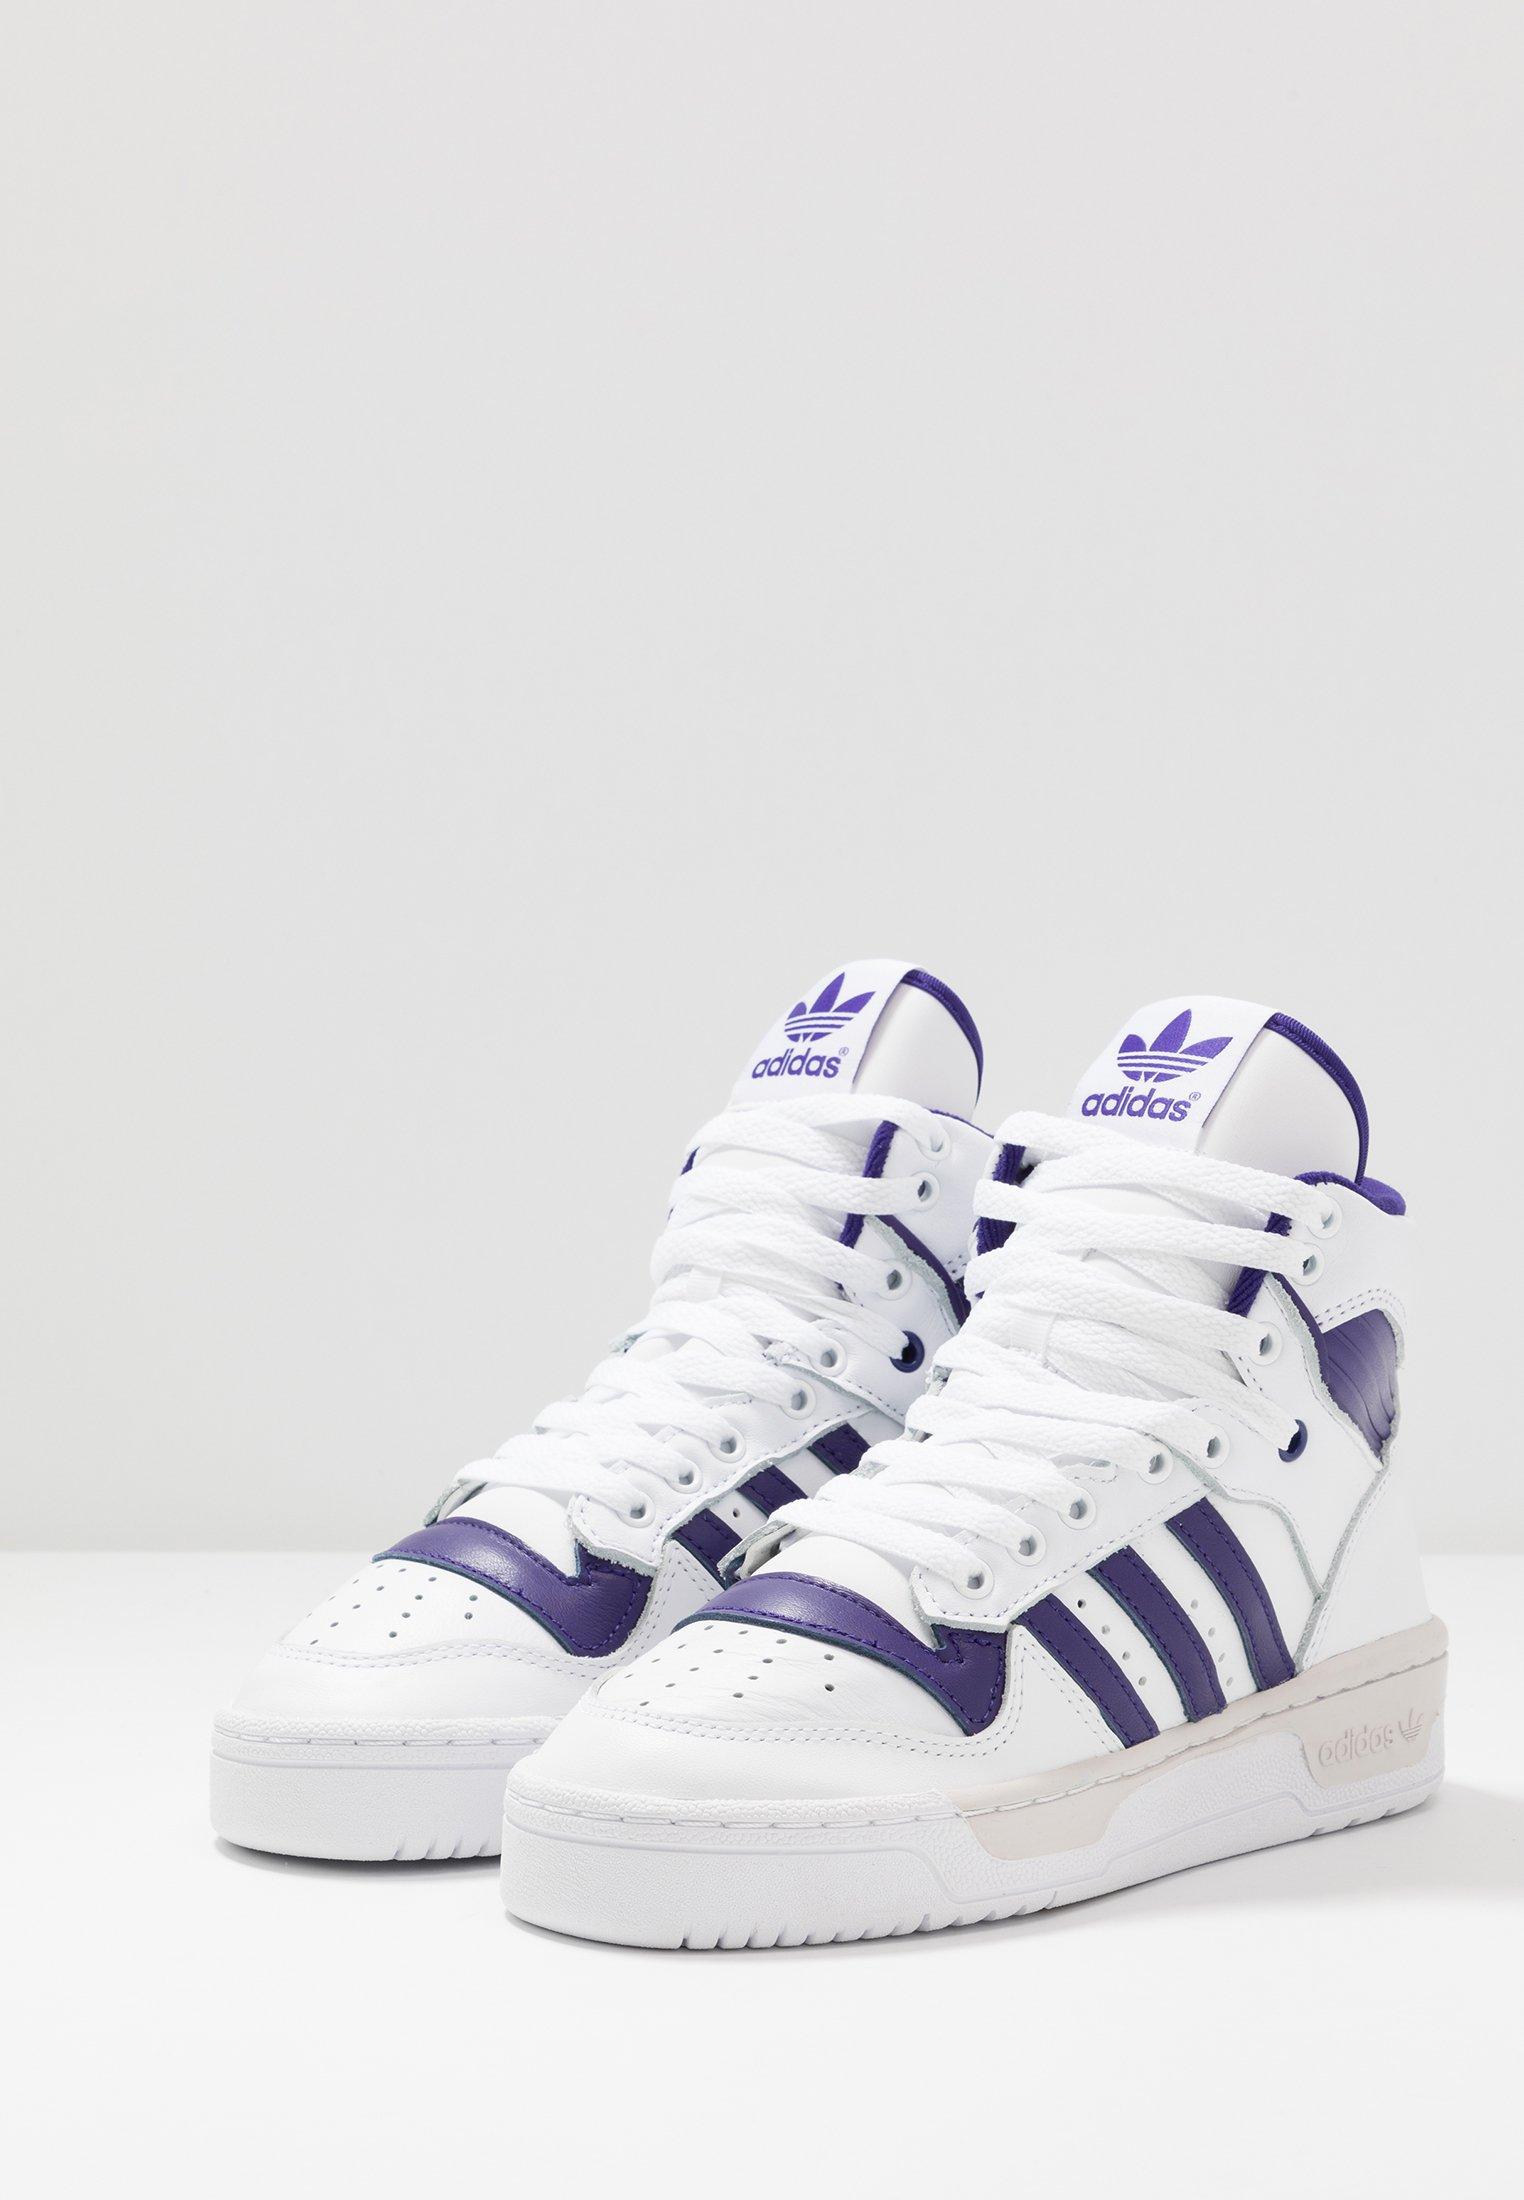 RIVALRYBaskets montantes purple grey one footwear clear adidas Originals white PuXOkZi